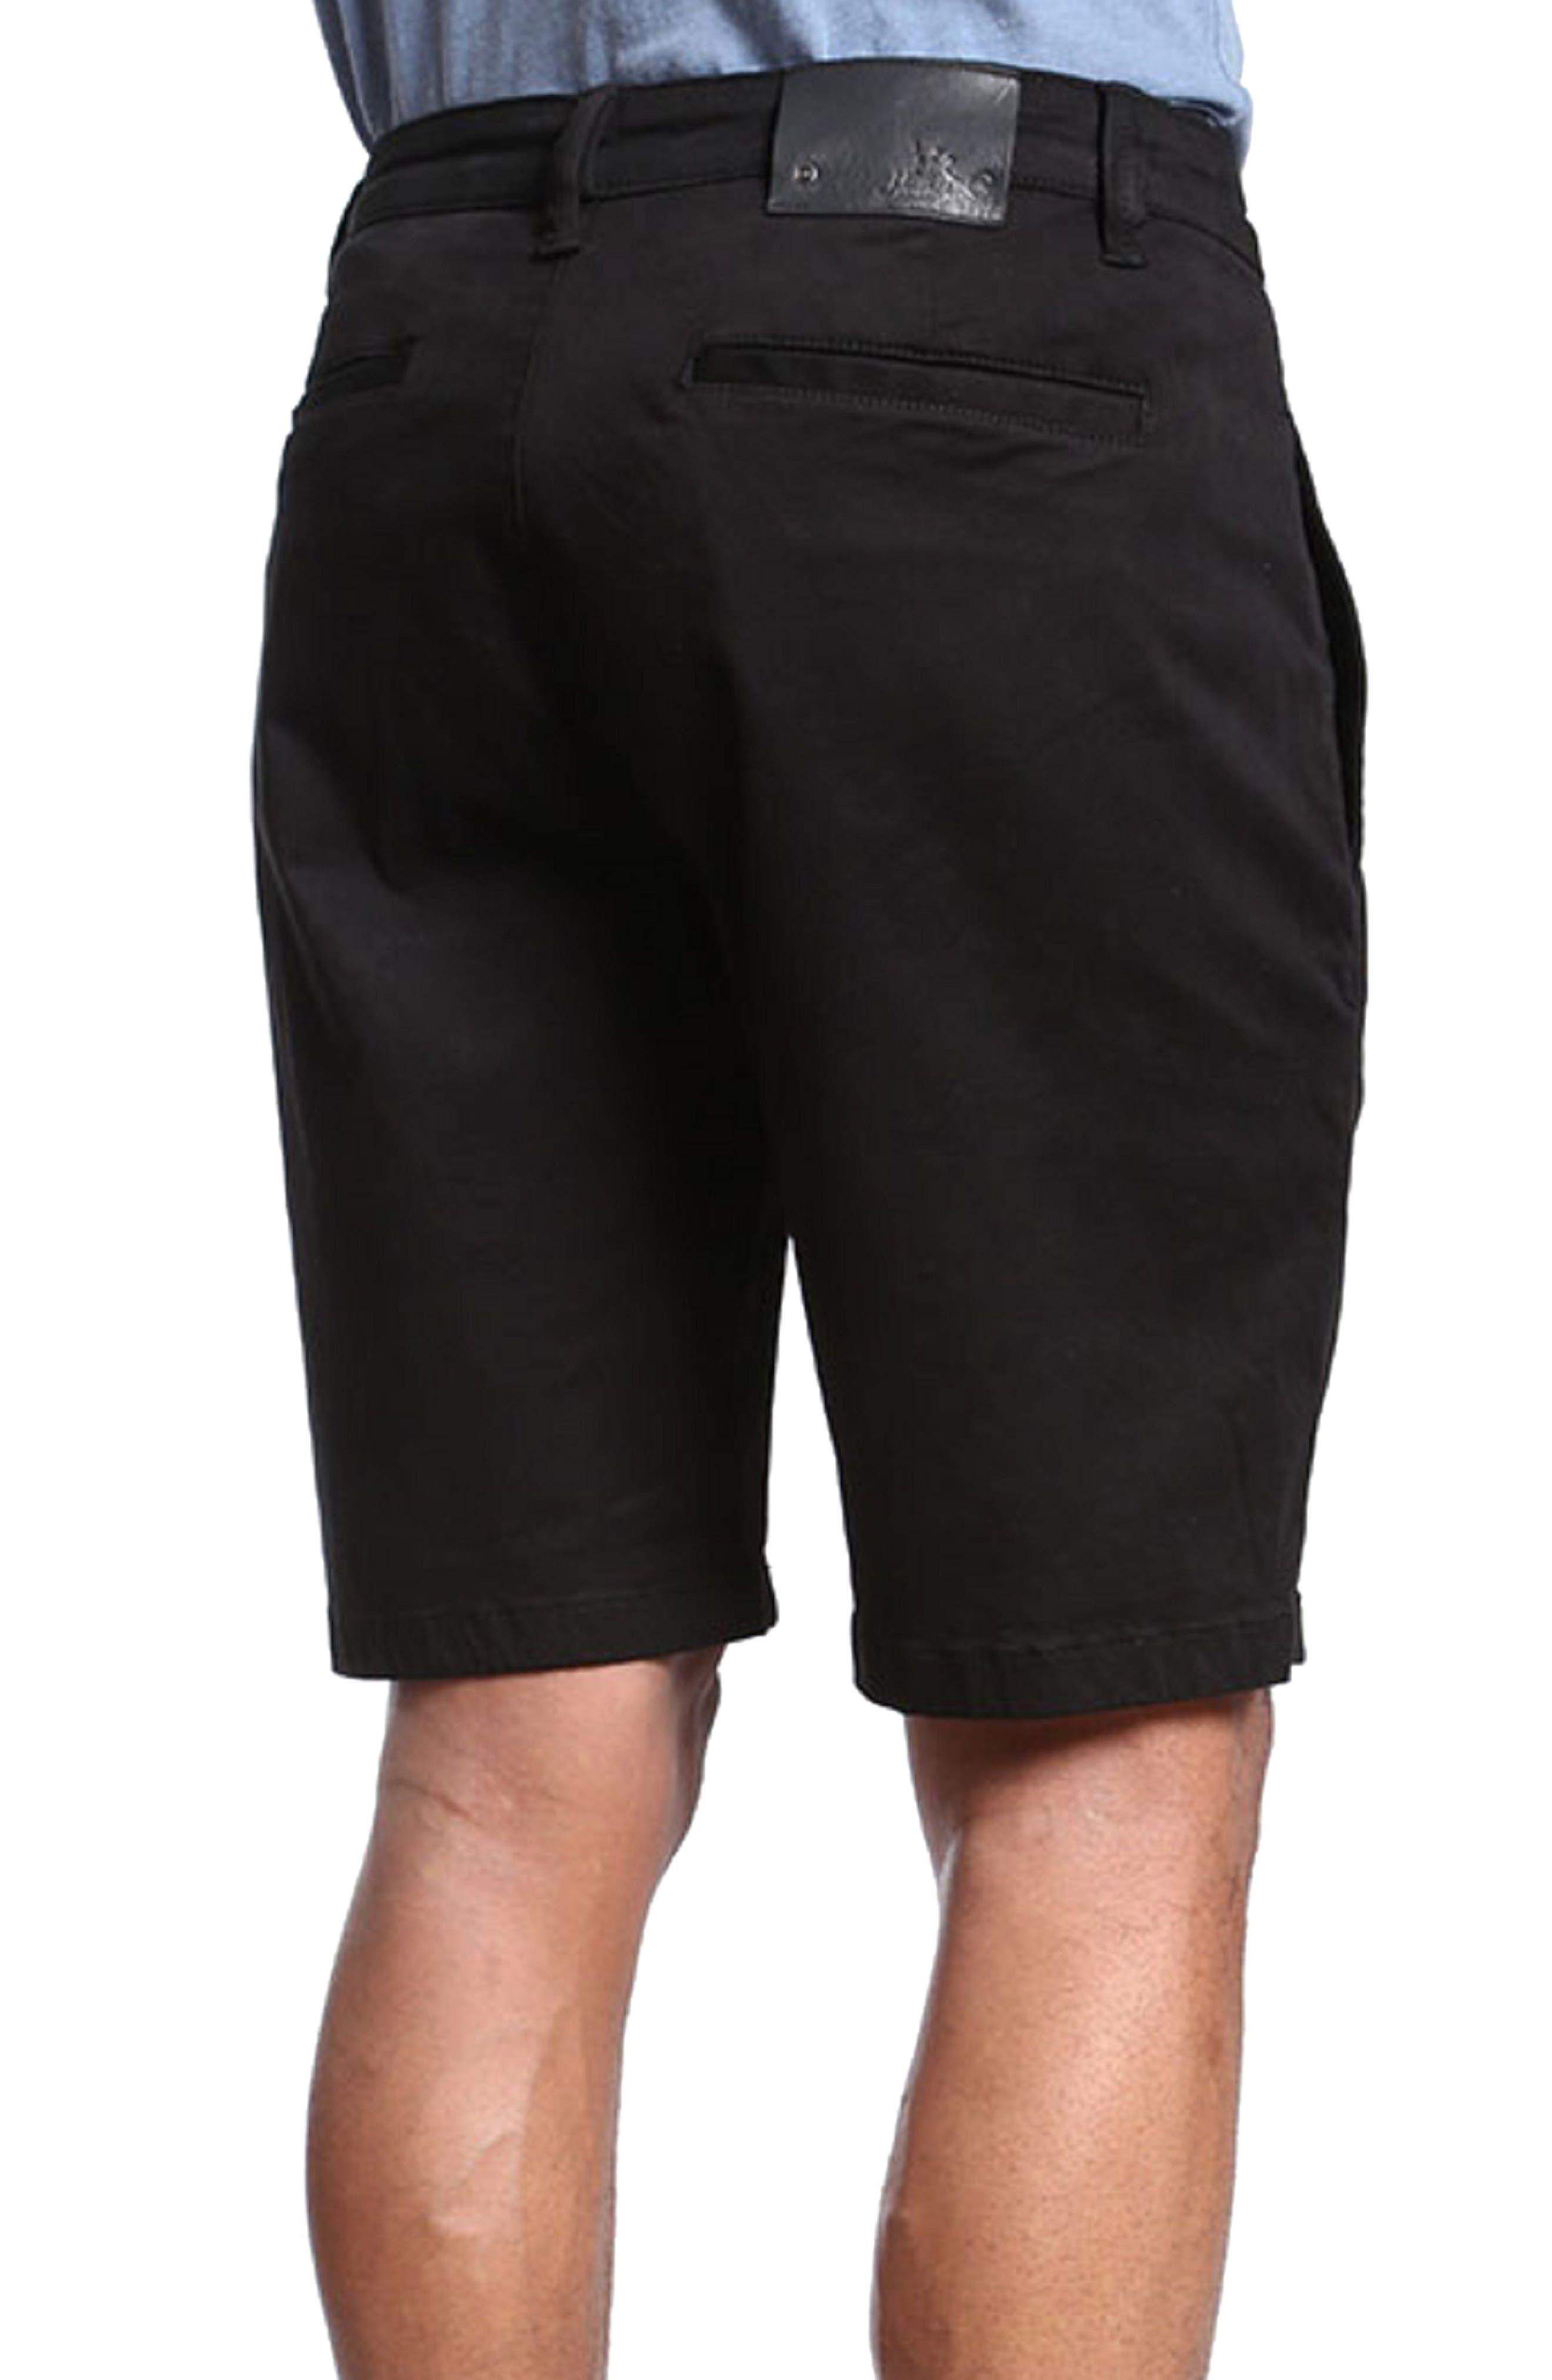 Nevada Twill Shorts,                             Alternate thumbnail 2, color,                             BLACK TWILL